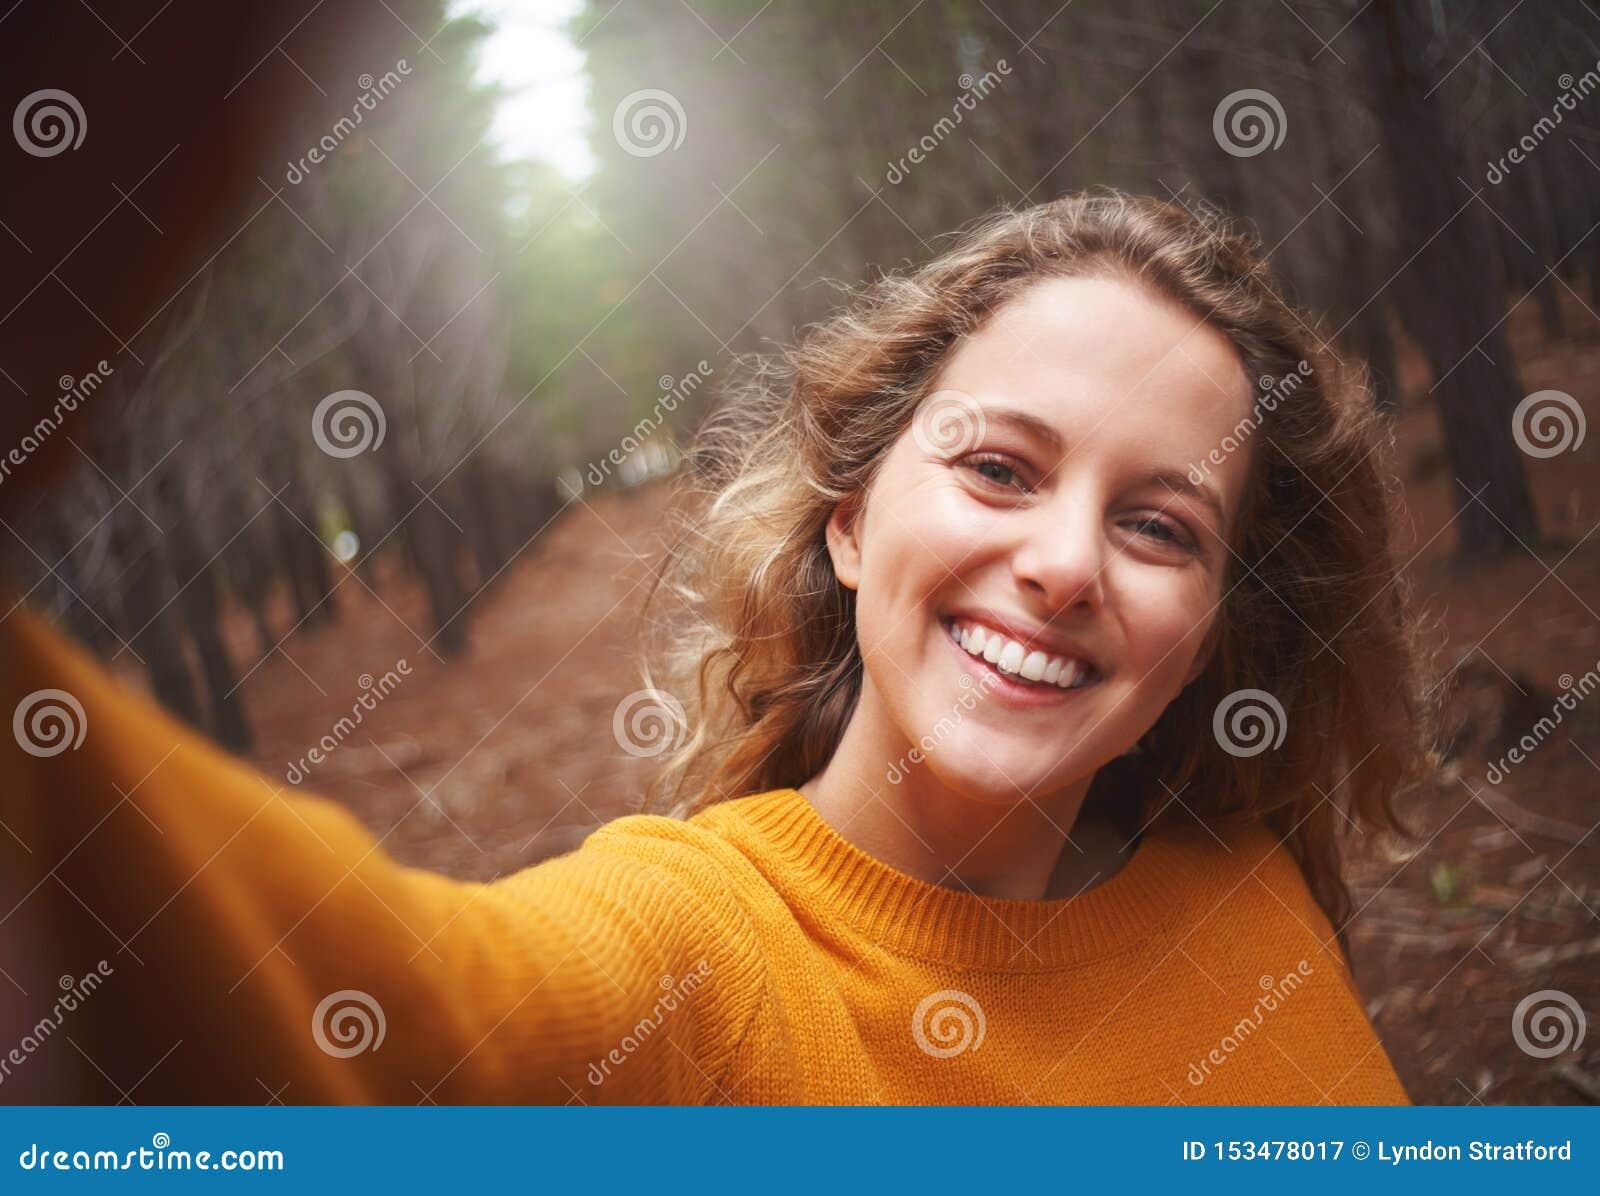 Zelfportret van speelse glimlachende jonge vrouw